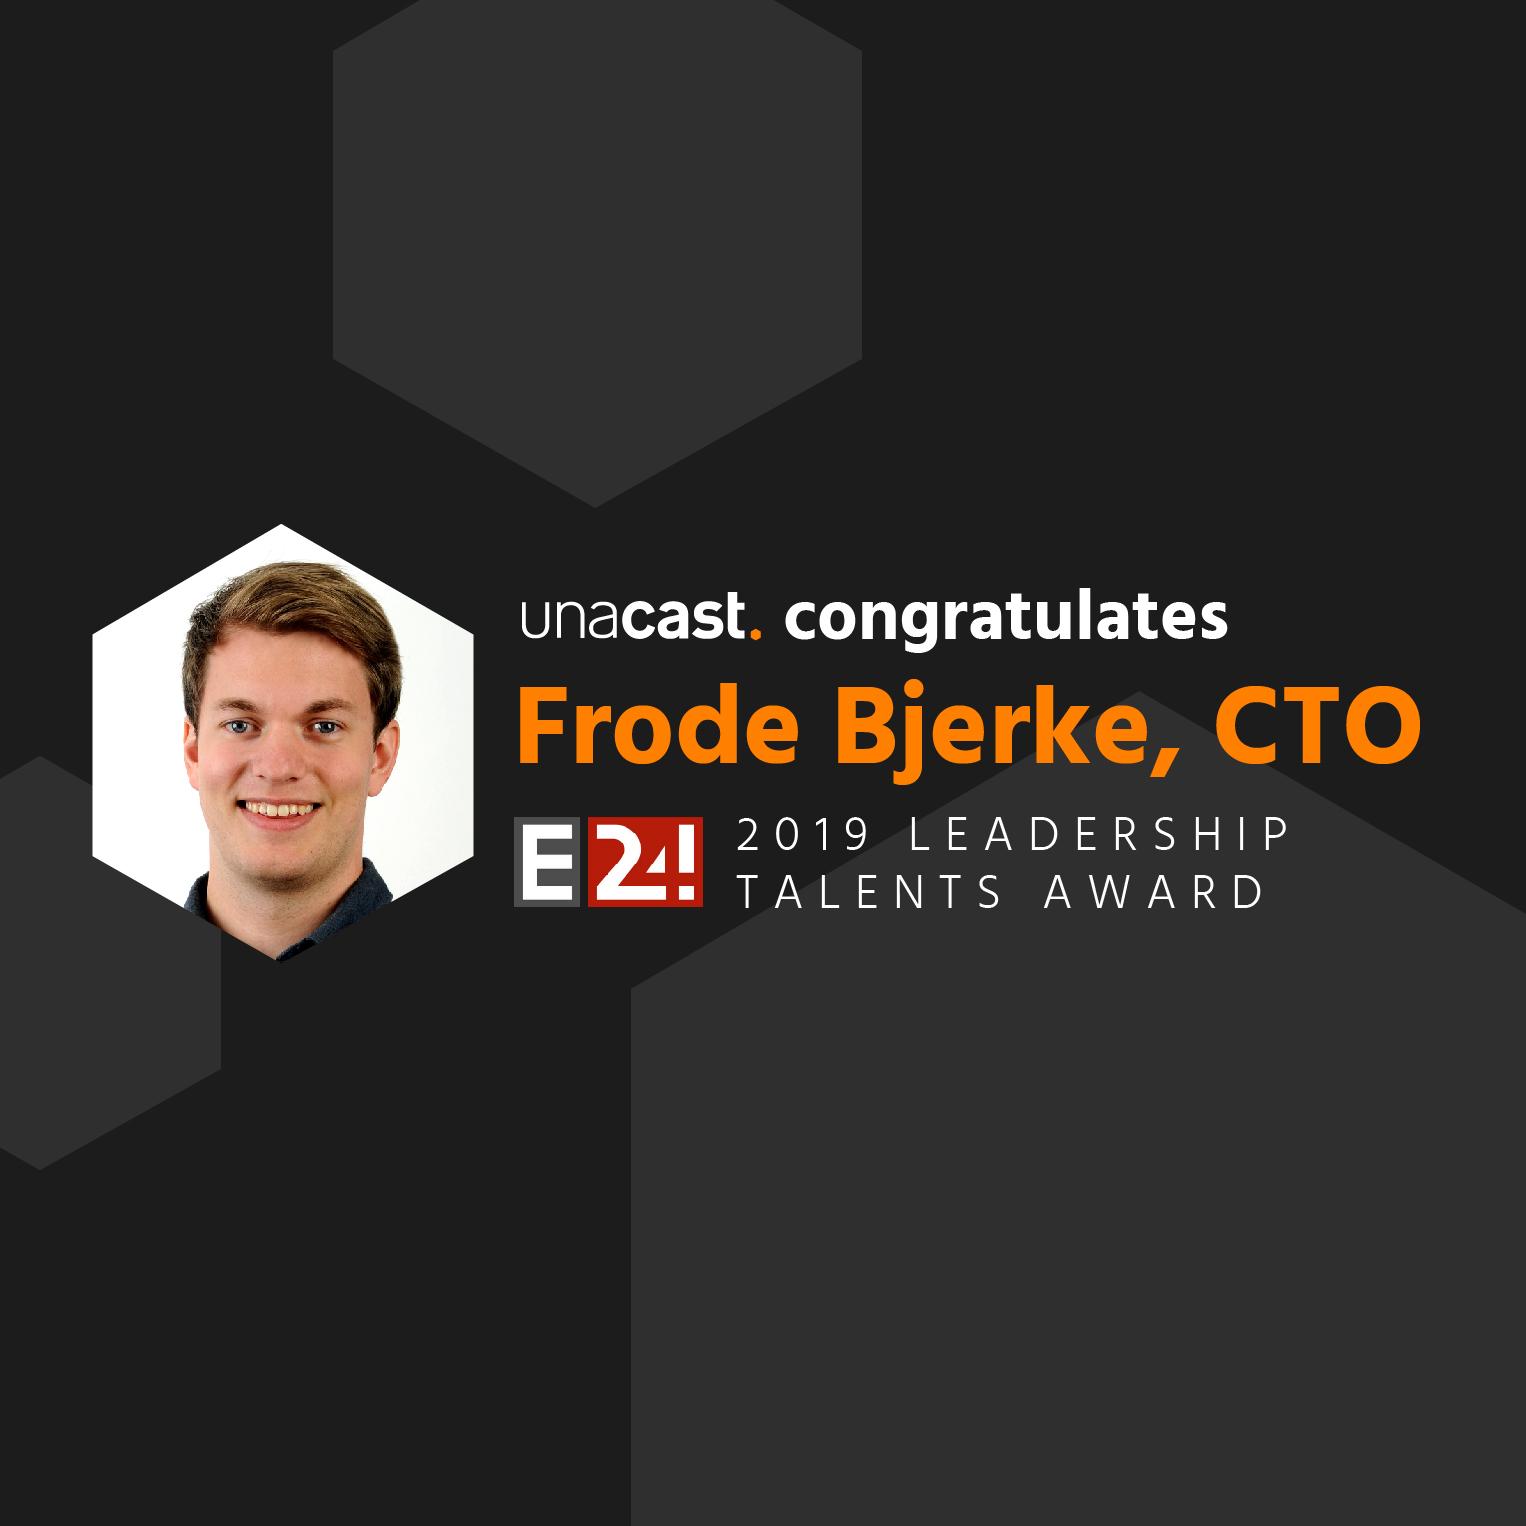 CTO Frode Bjerke Named to 2019 Leadership Talents Award